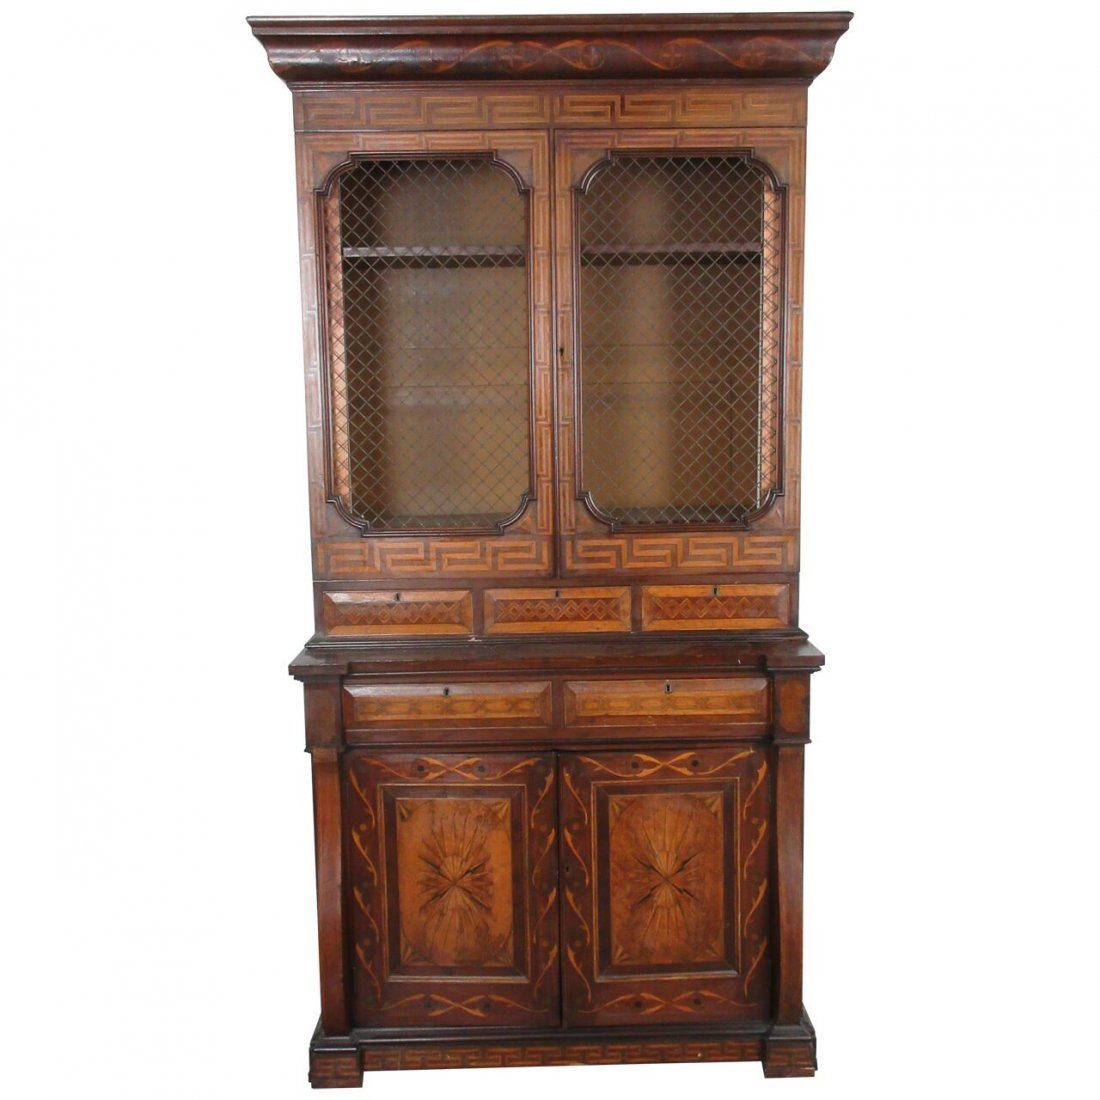 Inlaid Fine Antique Marquetry Bookcase